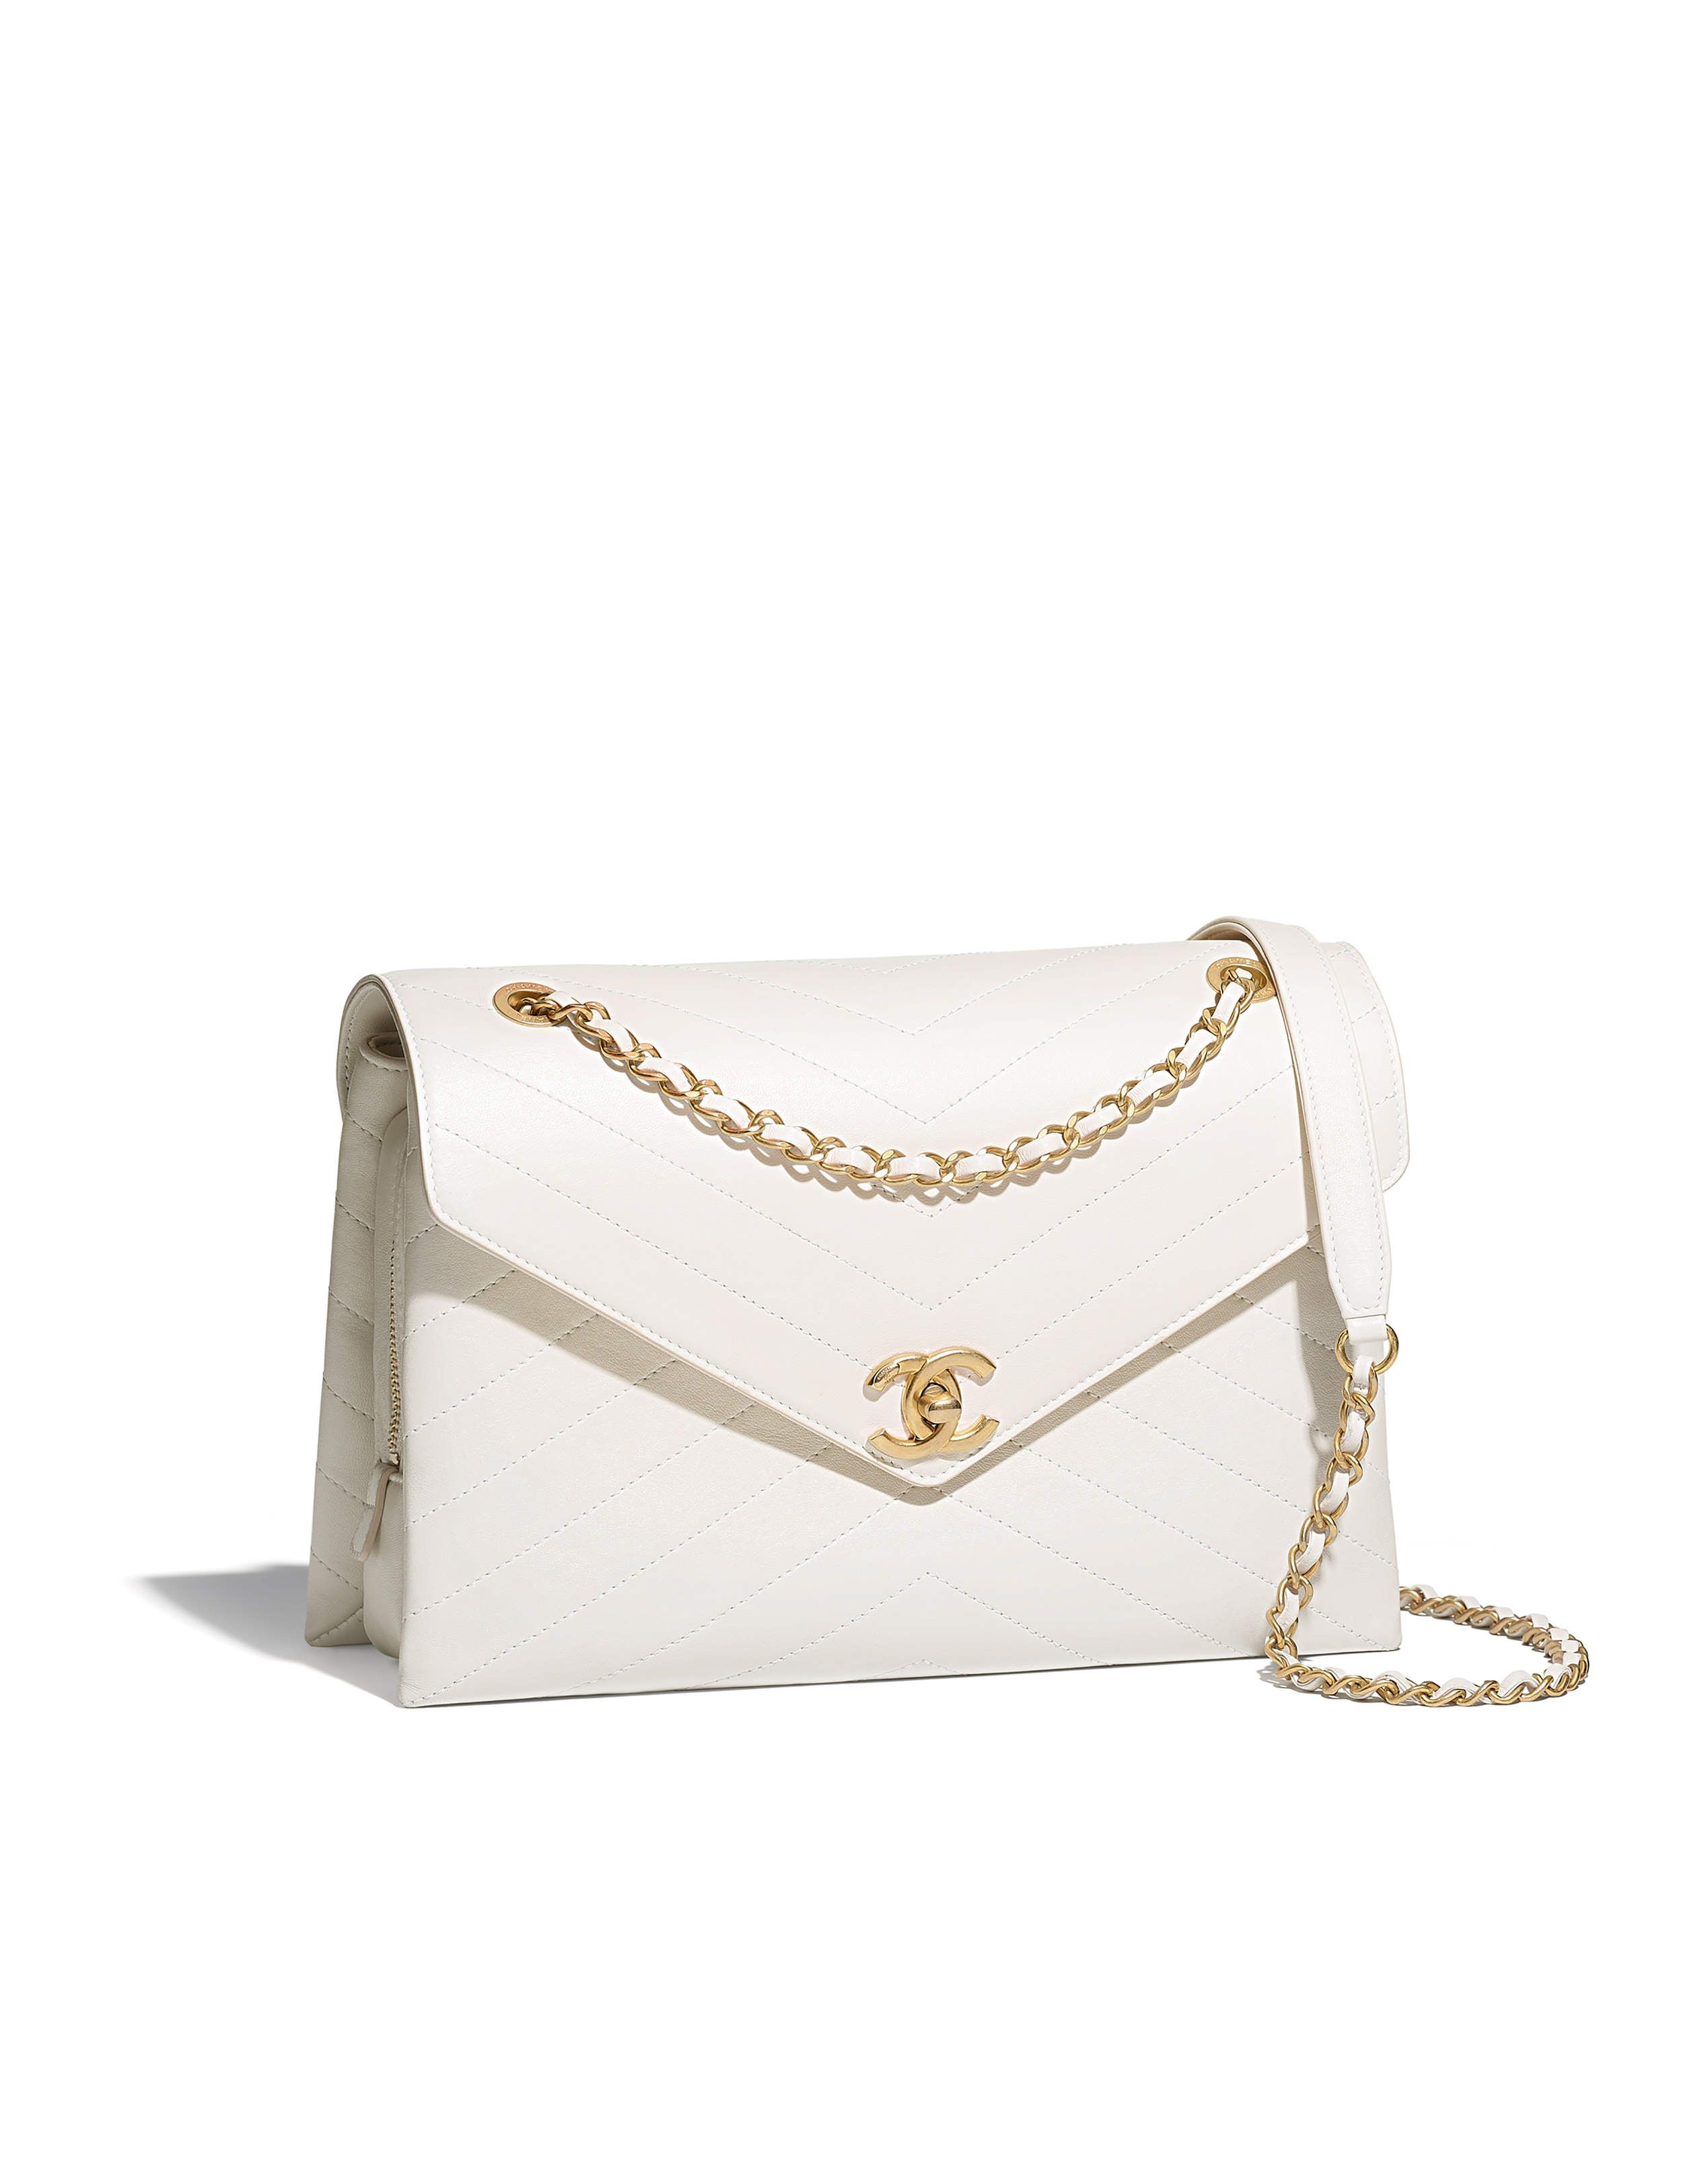 524e3a1307a8 SPRING-SUMMER 2018 - lambskin & gold-tone metal-white   Chanel bags ...